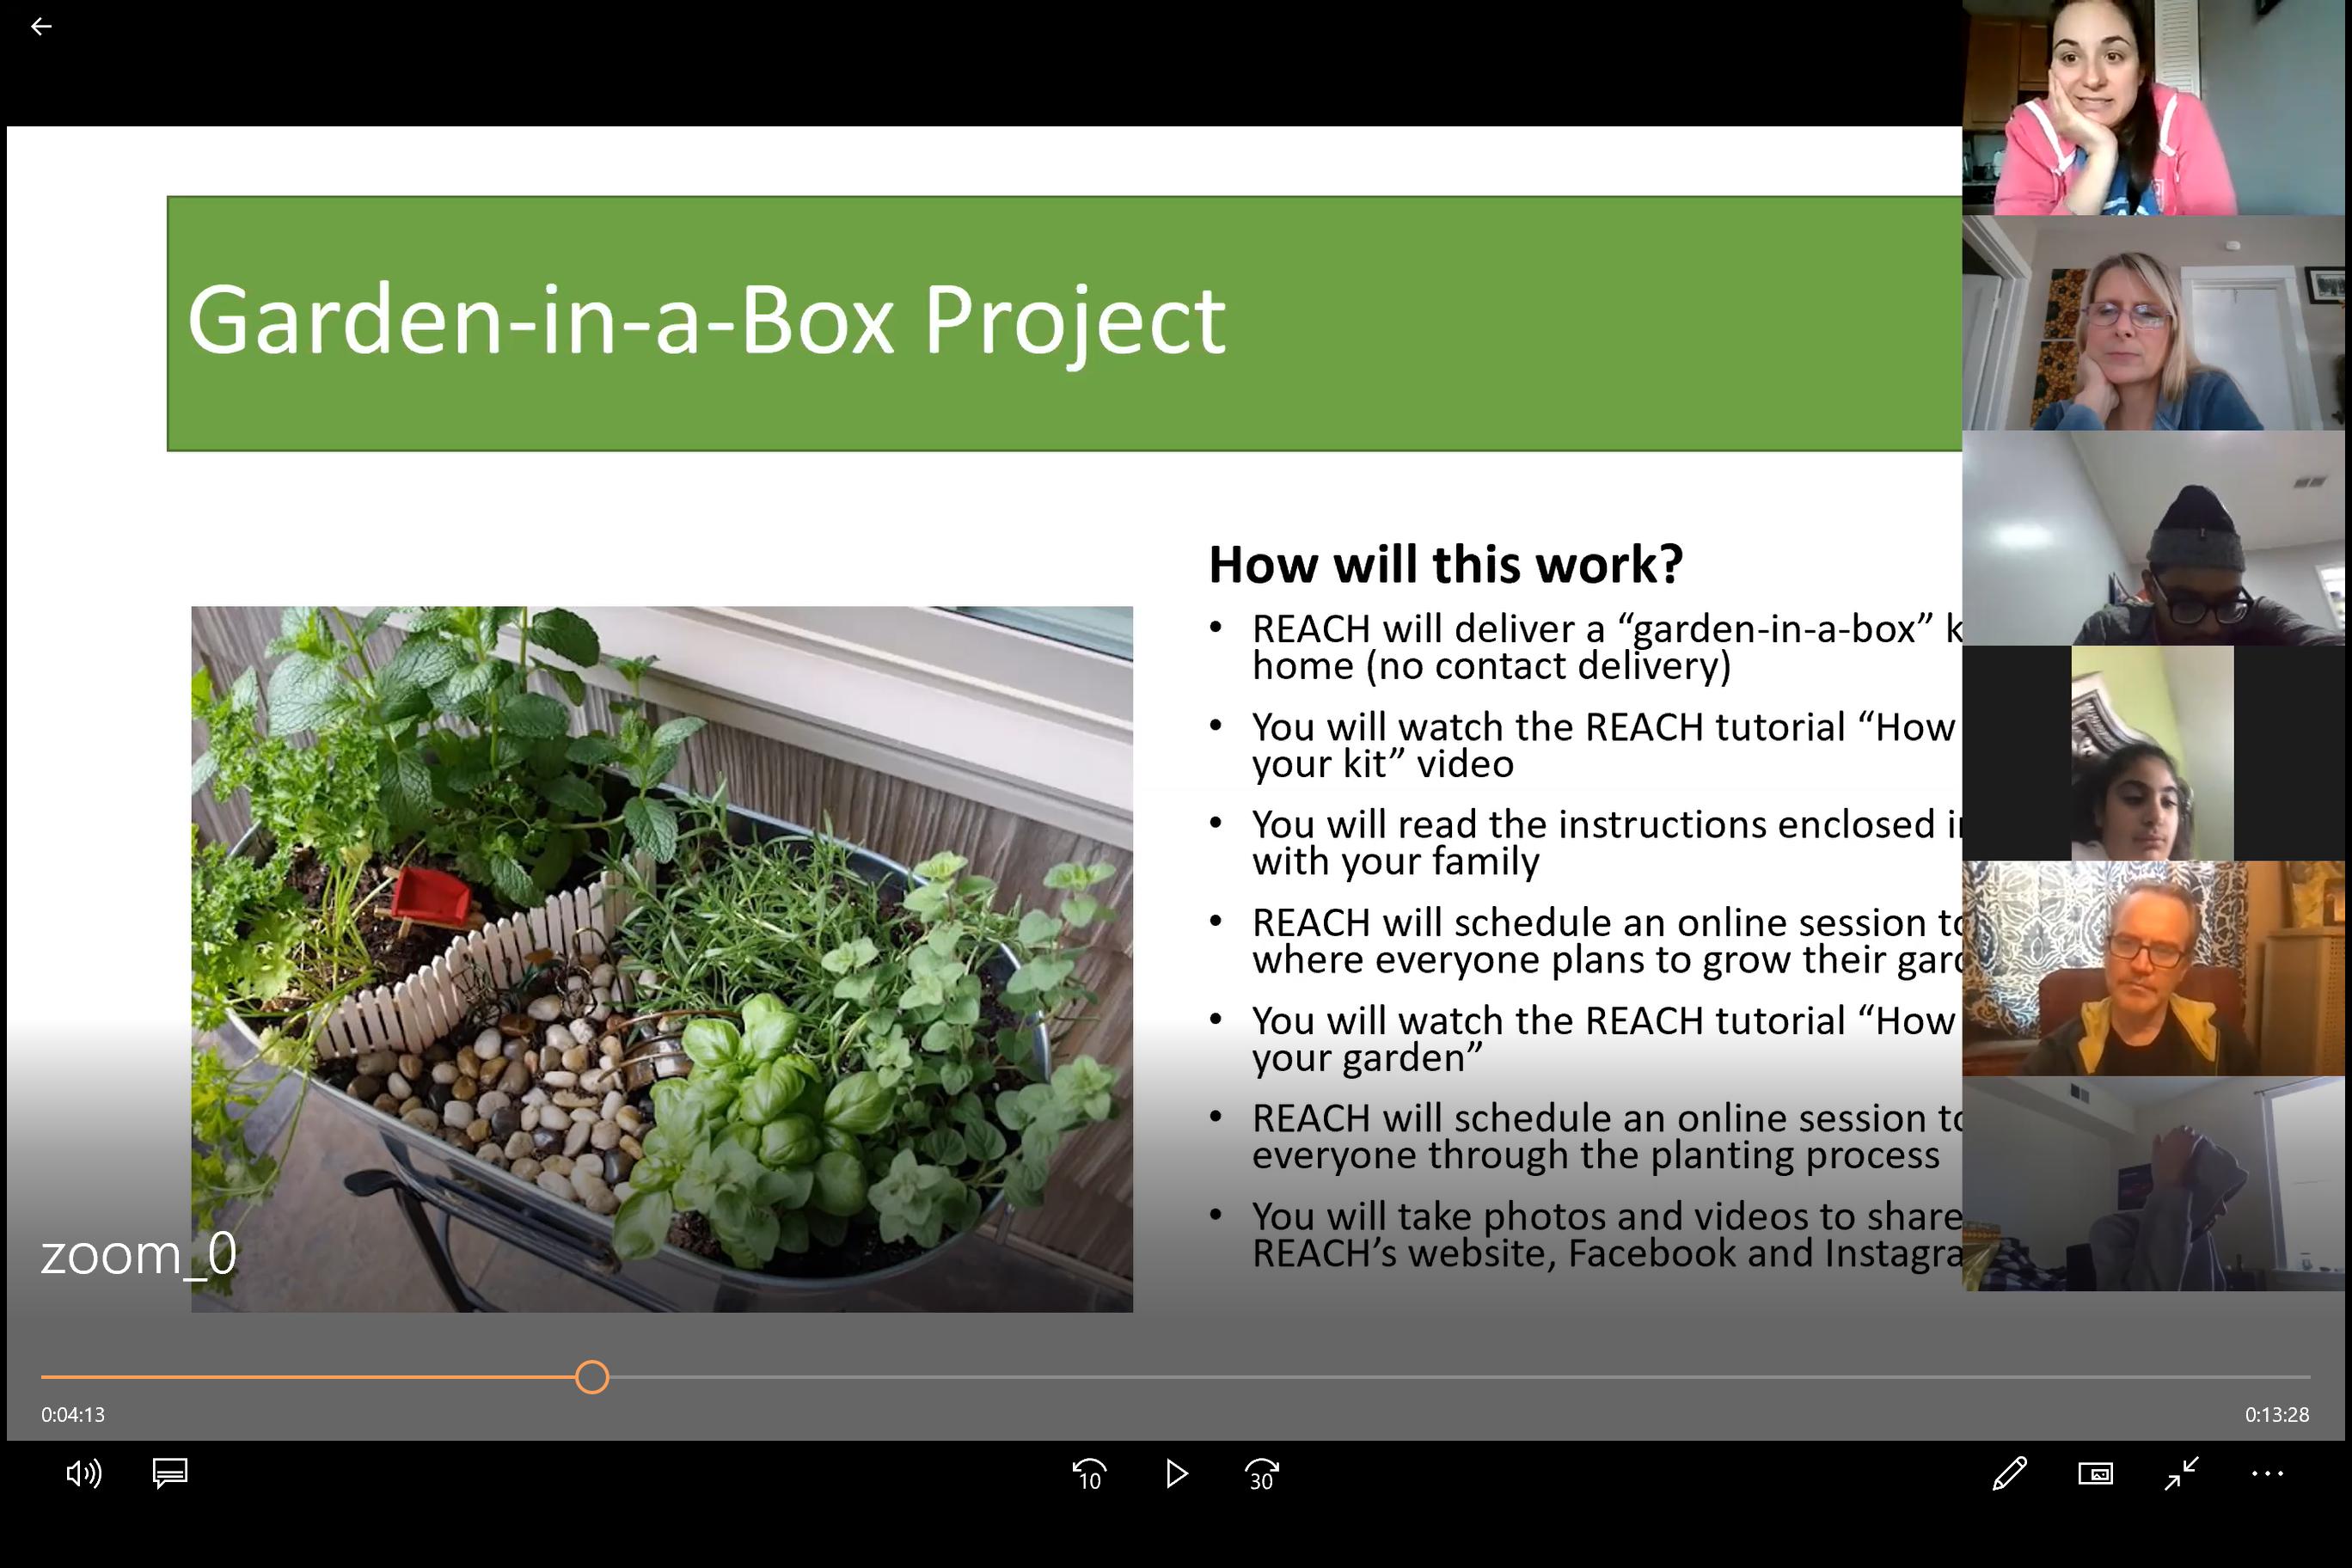 Online Session: Gardening Intro